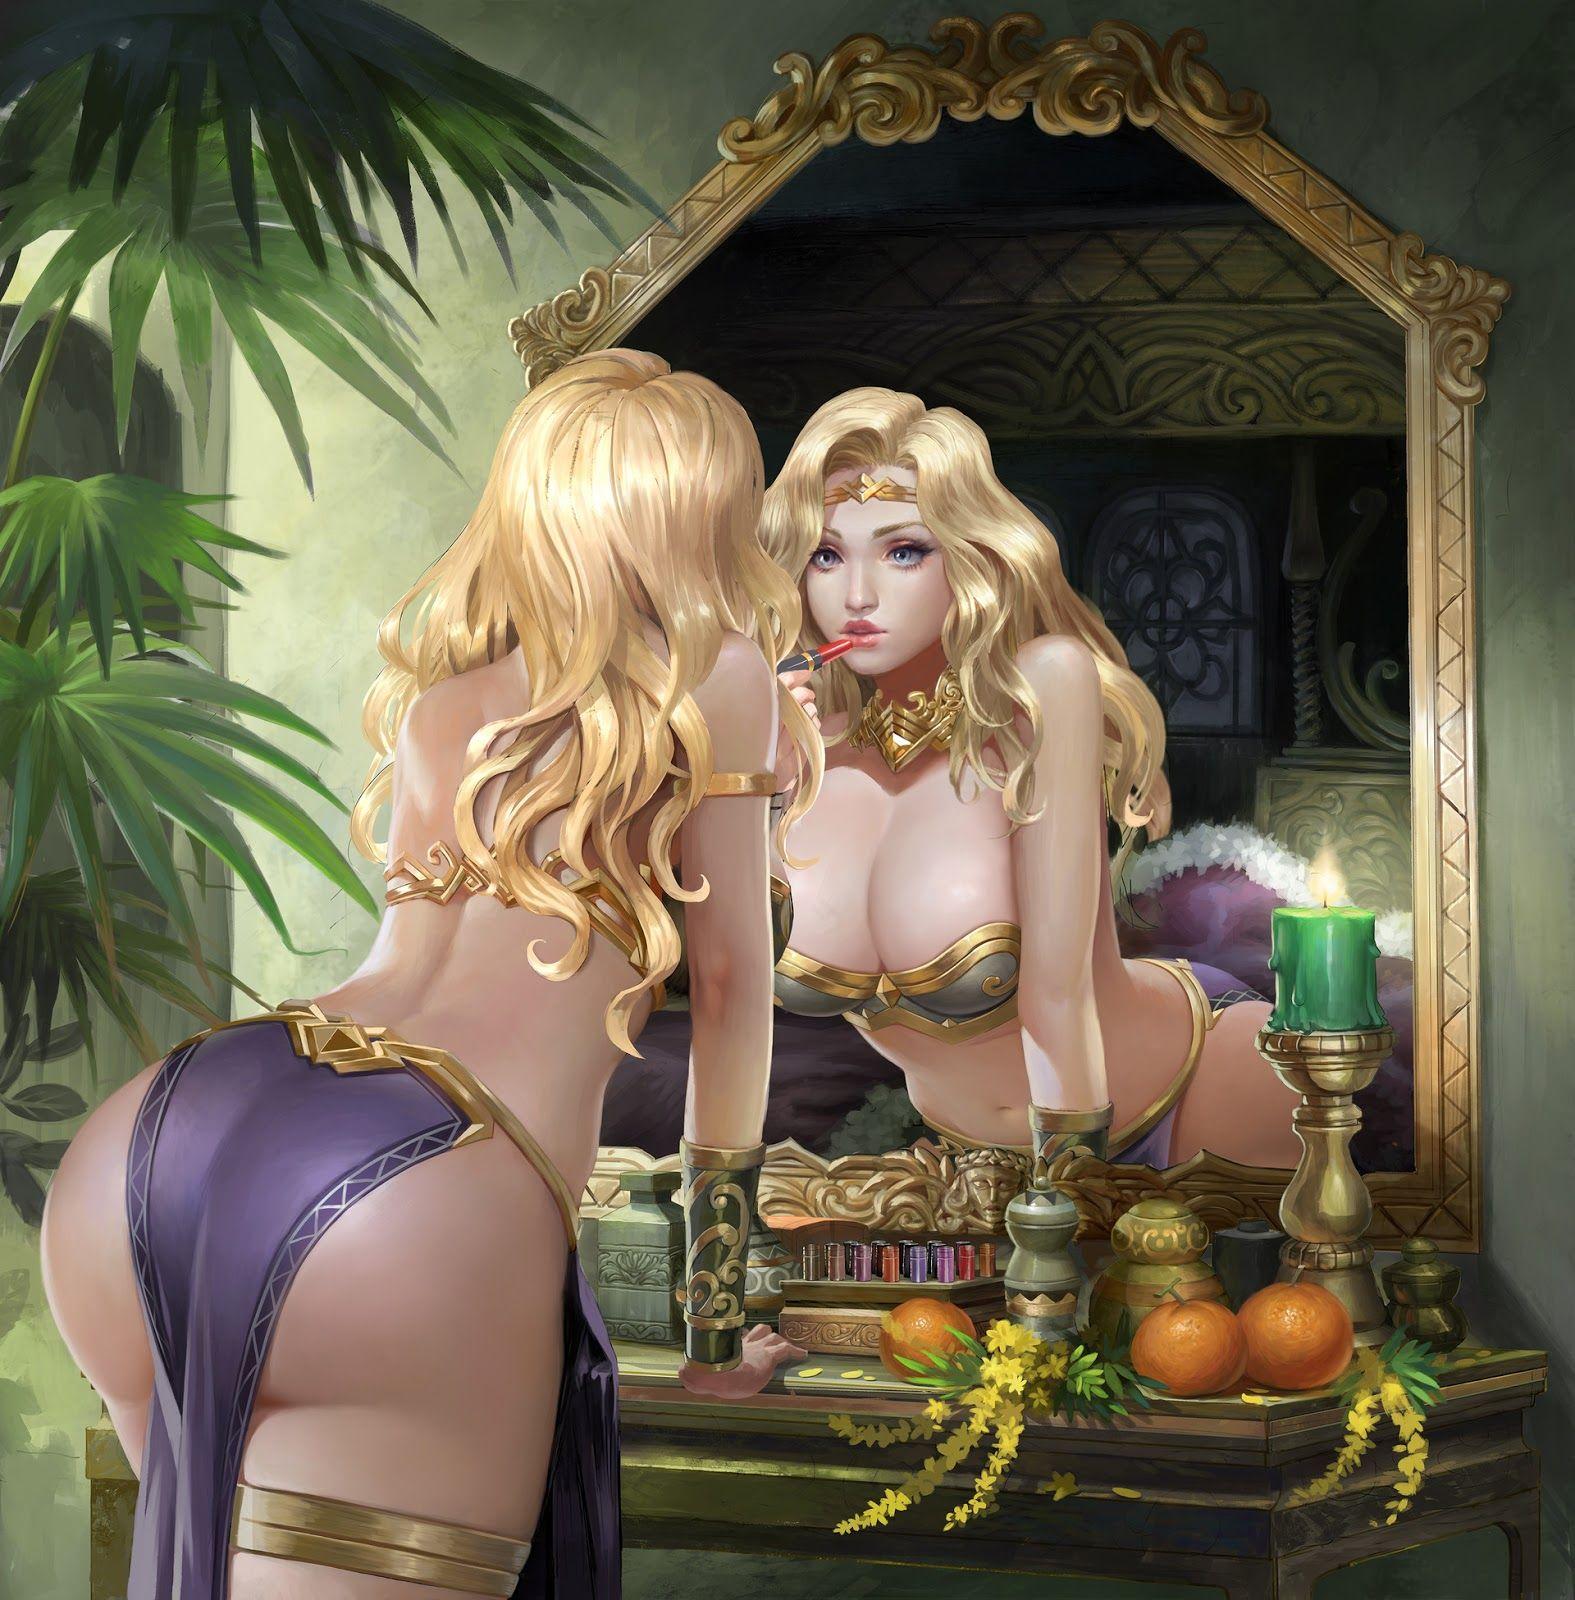 French maid fantasy